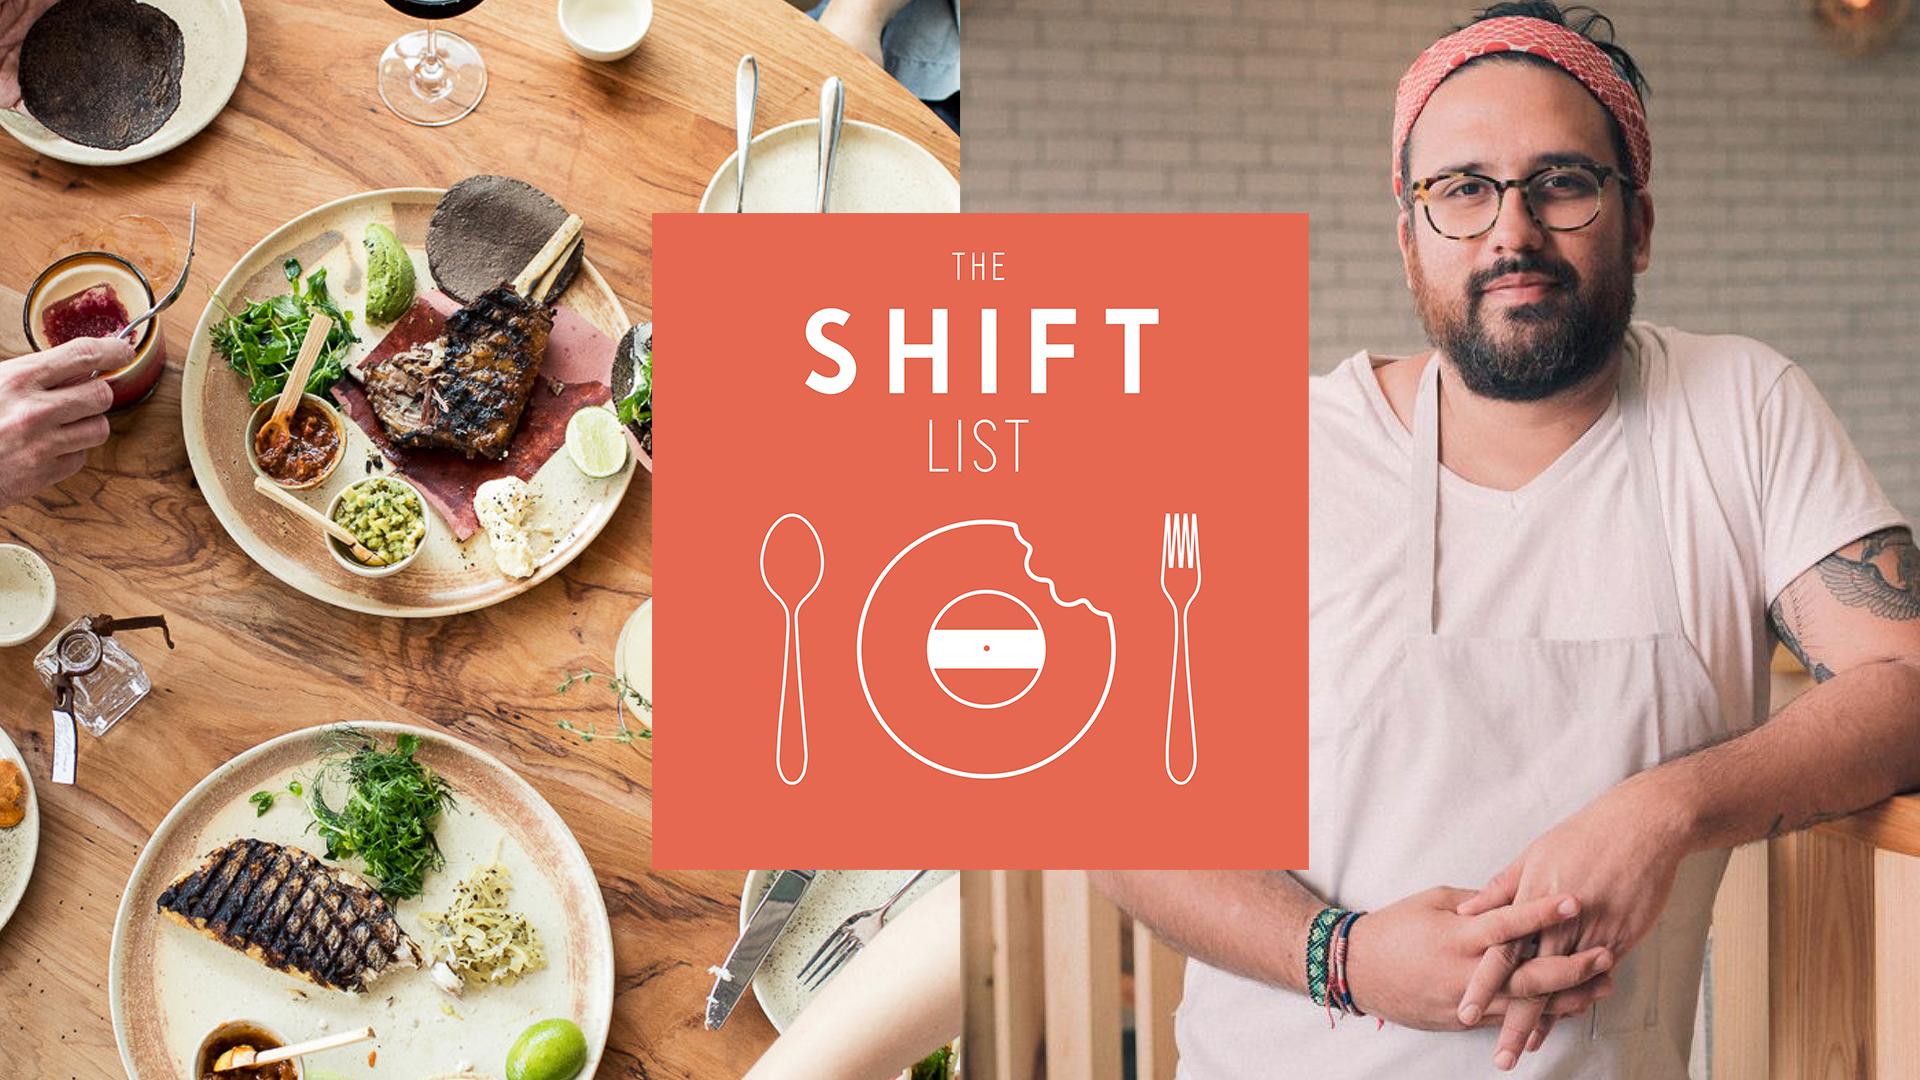 The Shift List - Chef Fermín Núñez (Suerte) - Austin, TX